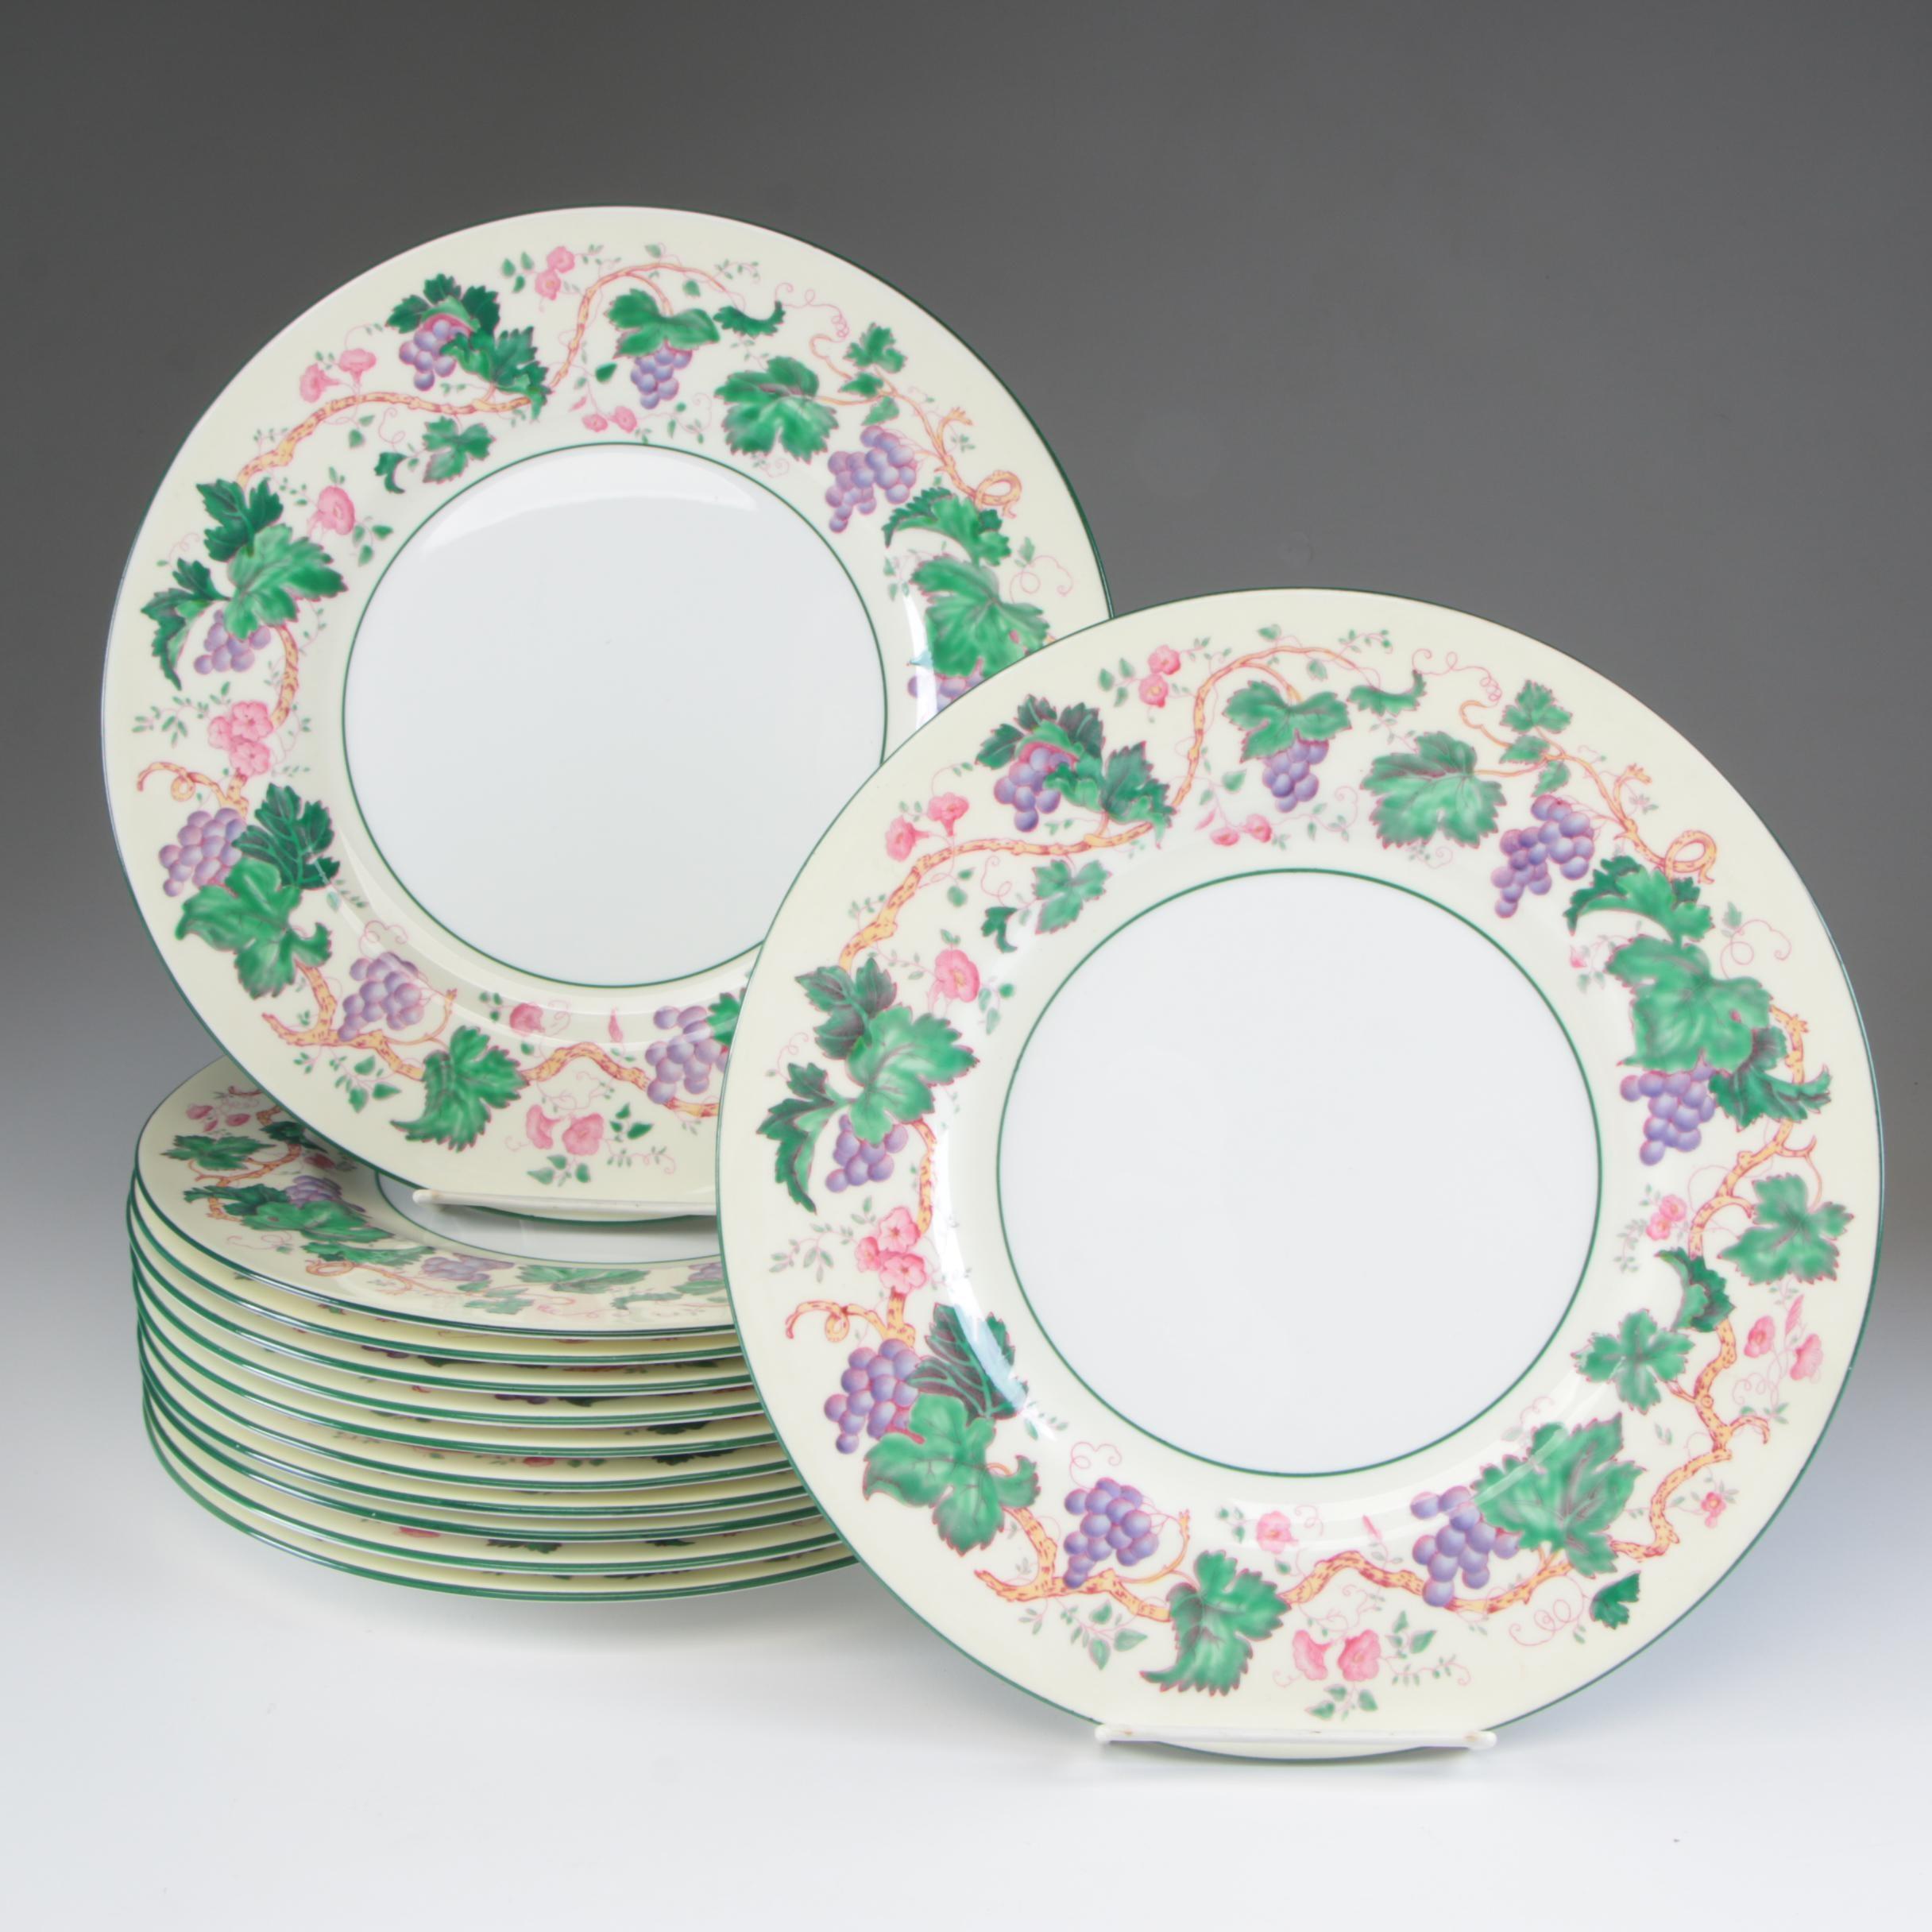 Wedgwood Bone China Dinner Plates, Early 20th Century